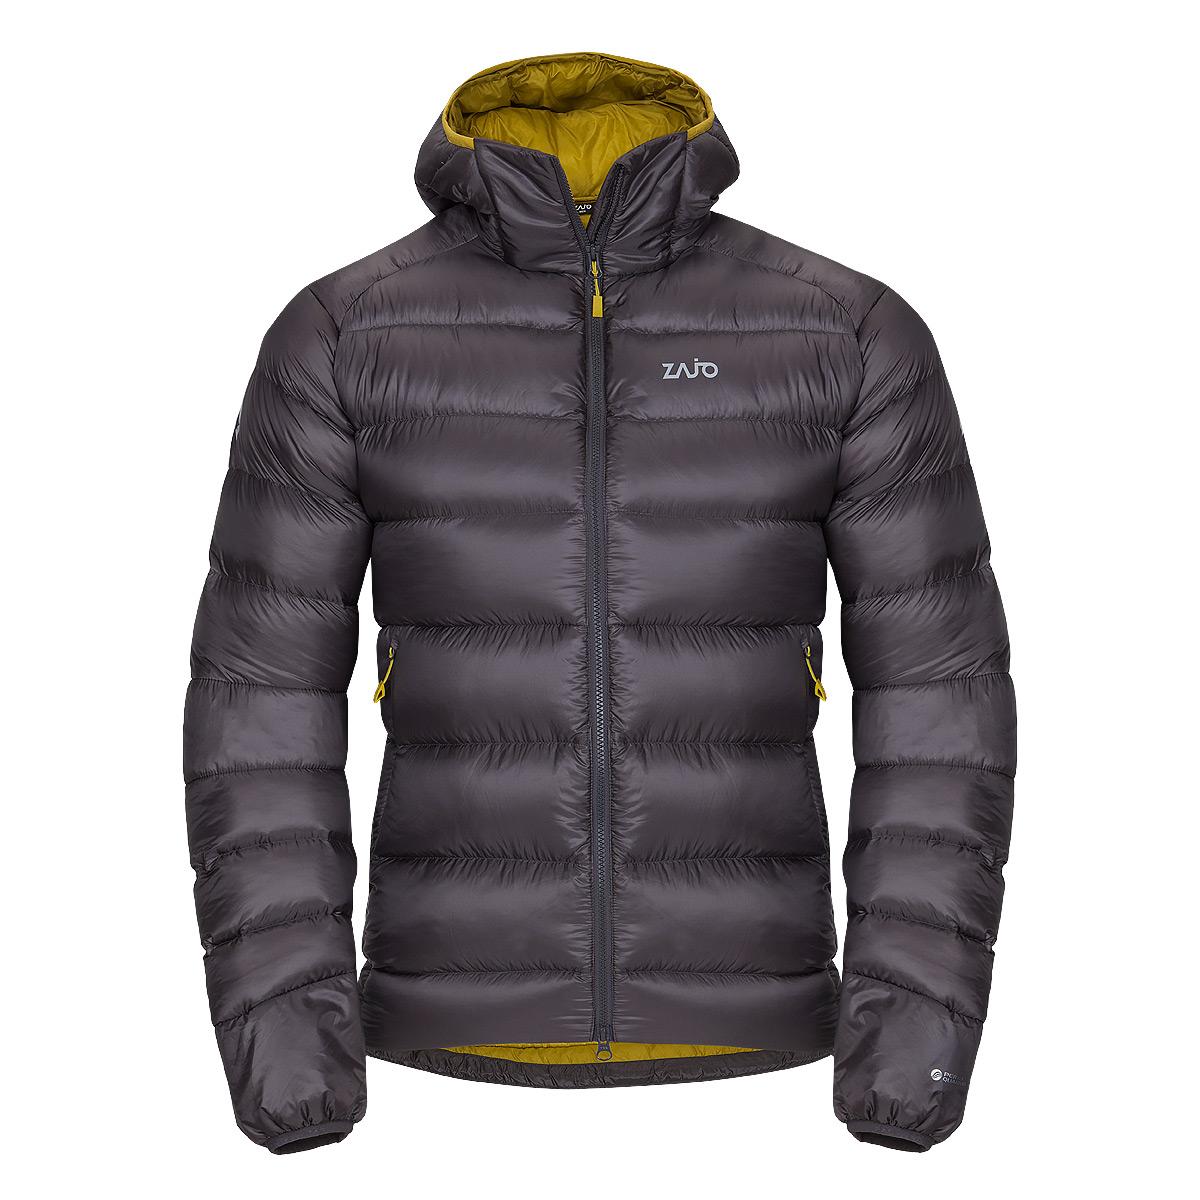 Pánska bunda Zajo Moritz JKT Magnet-Cress Green - veľkosť L